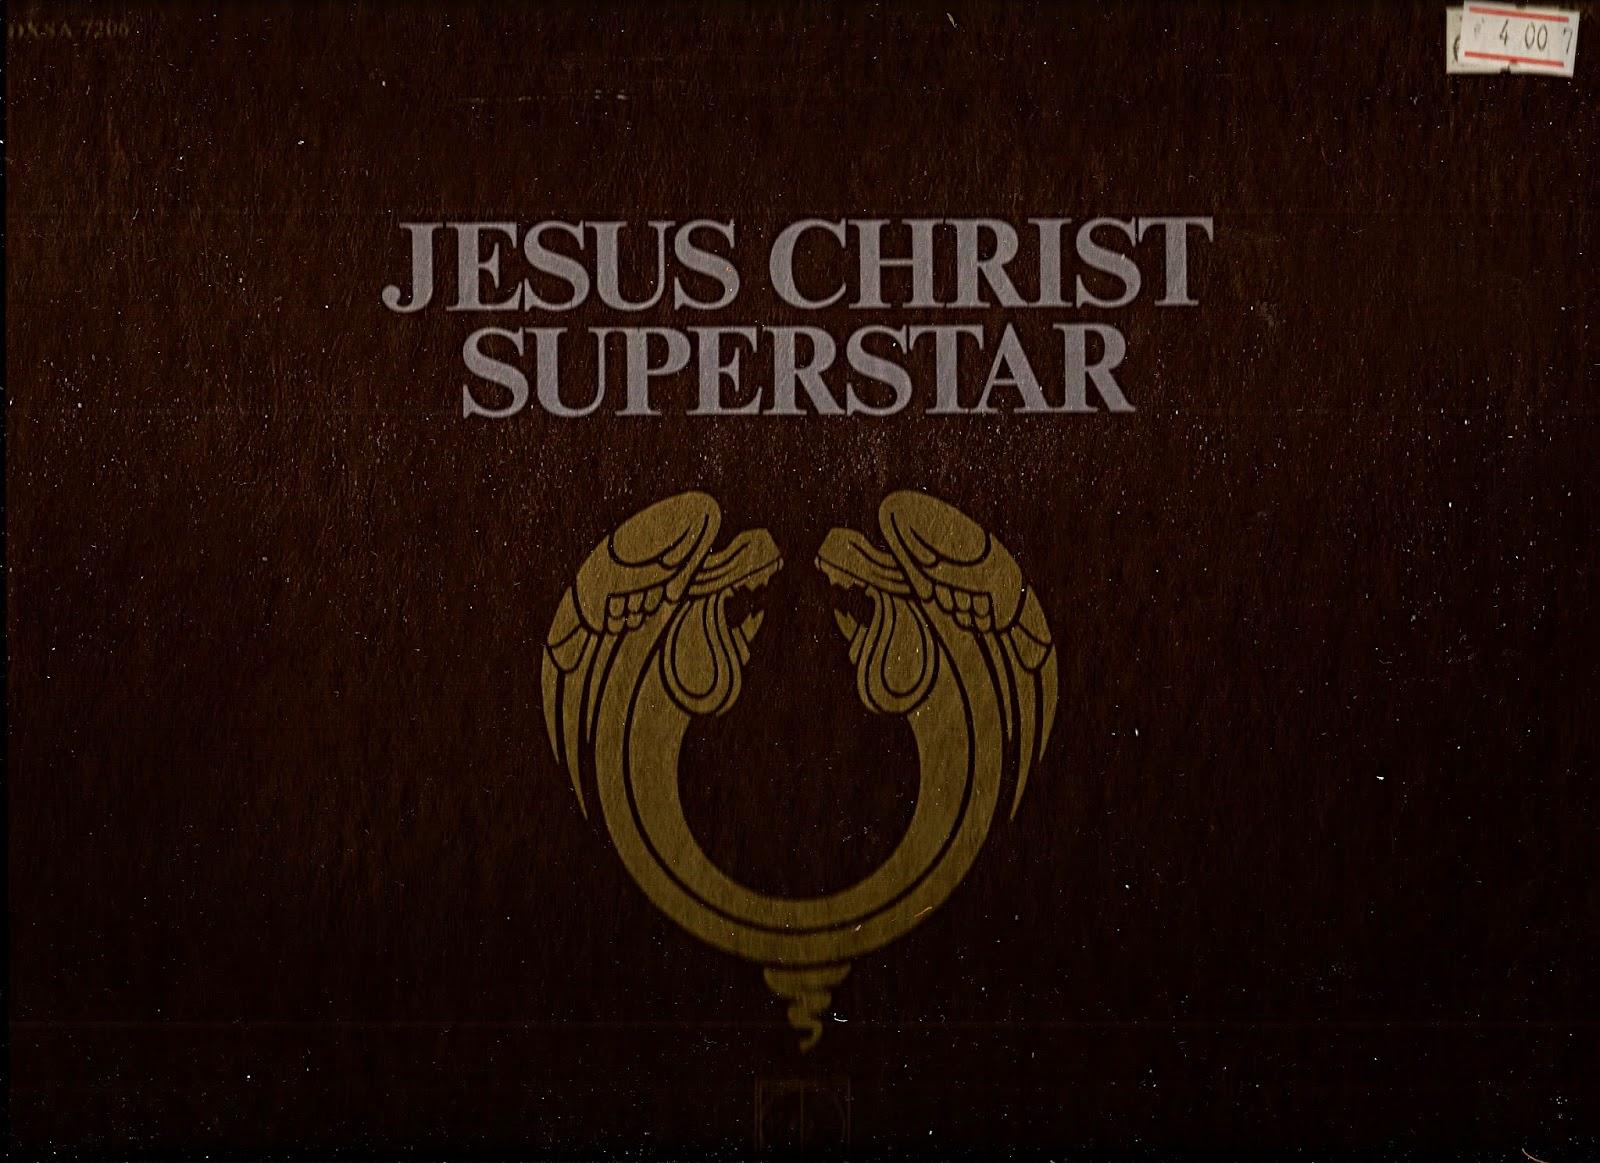 JESUCRISTO SÚPER ESTRELLA: RECOMENDACIÓN MUSICAL PARA ESTE VIERNES SANTO